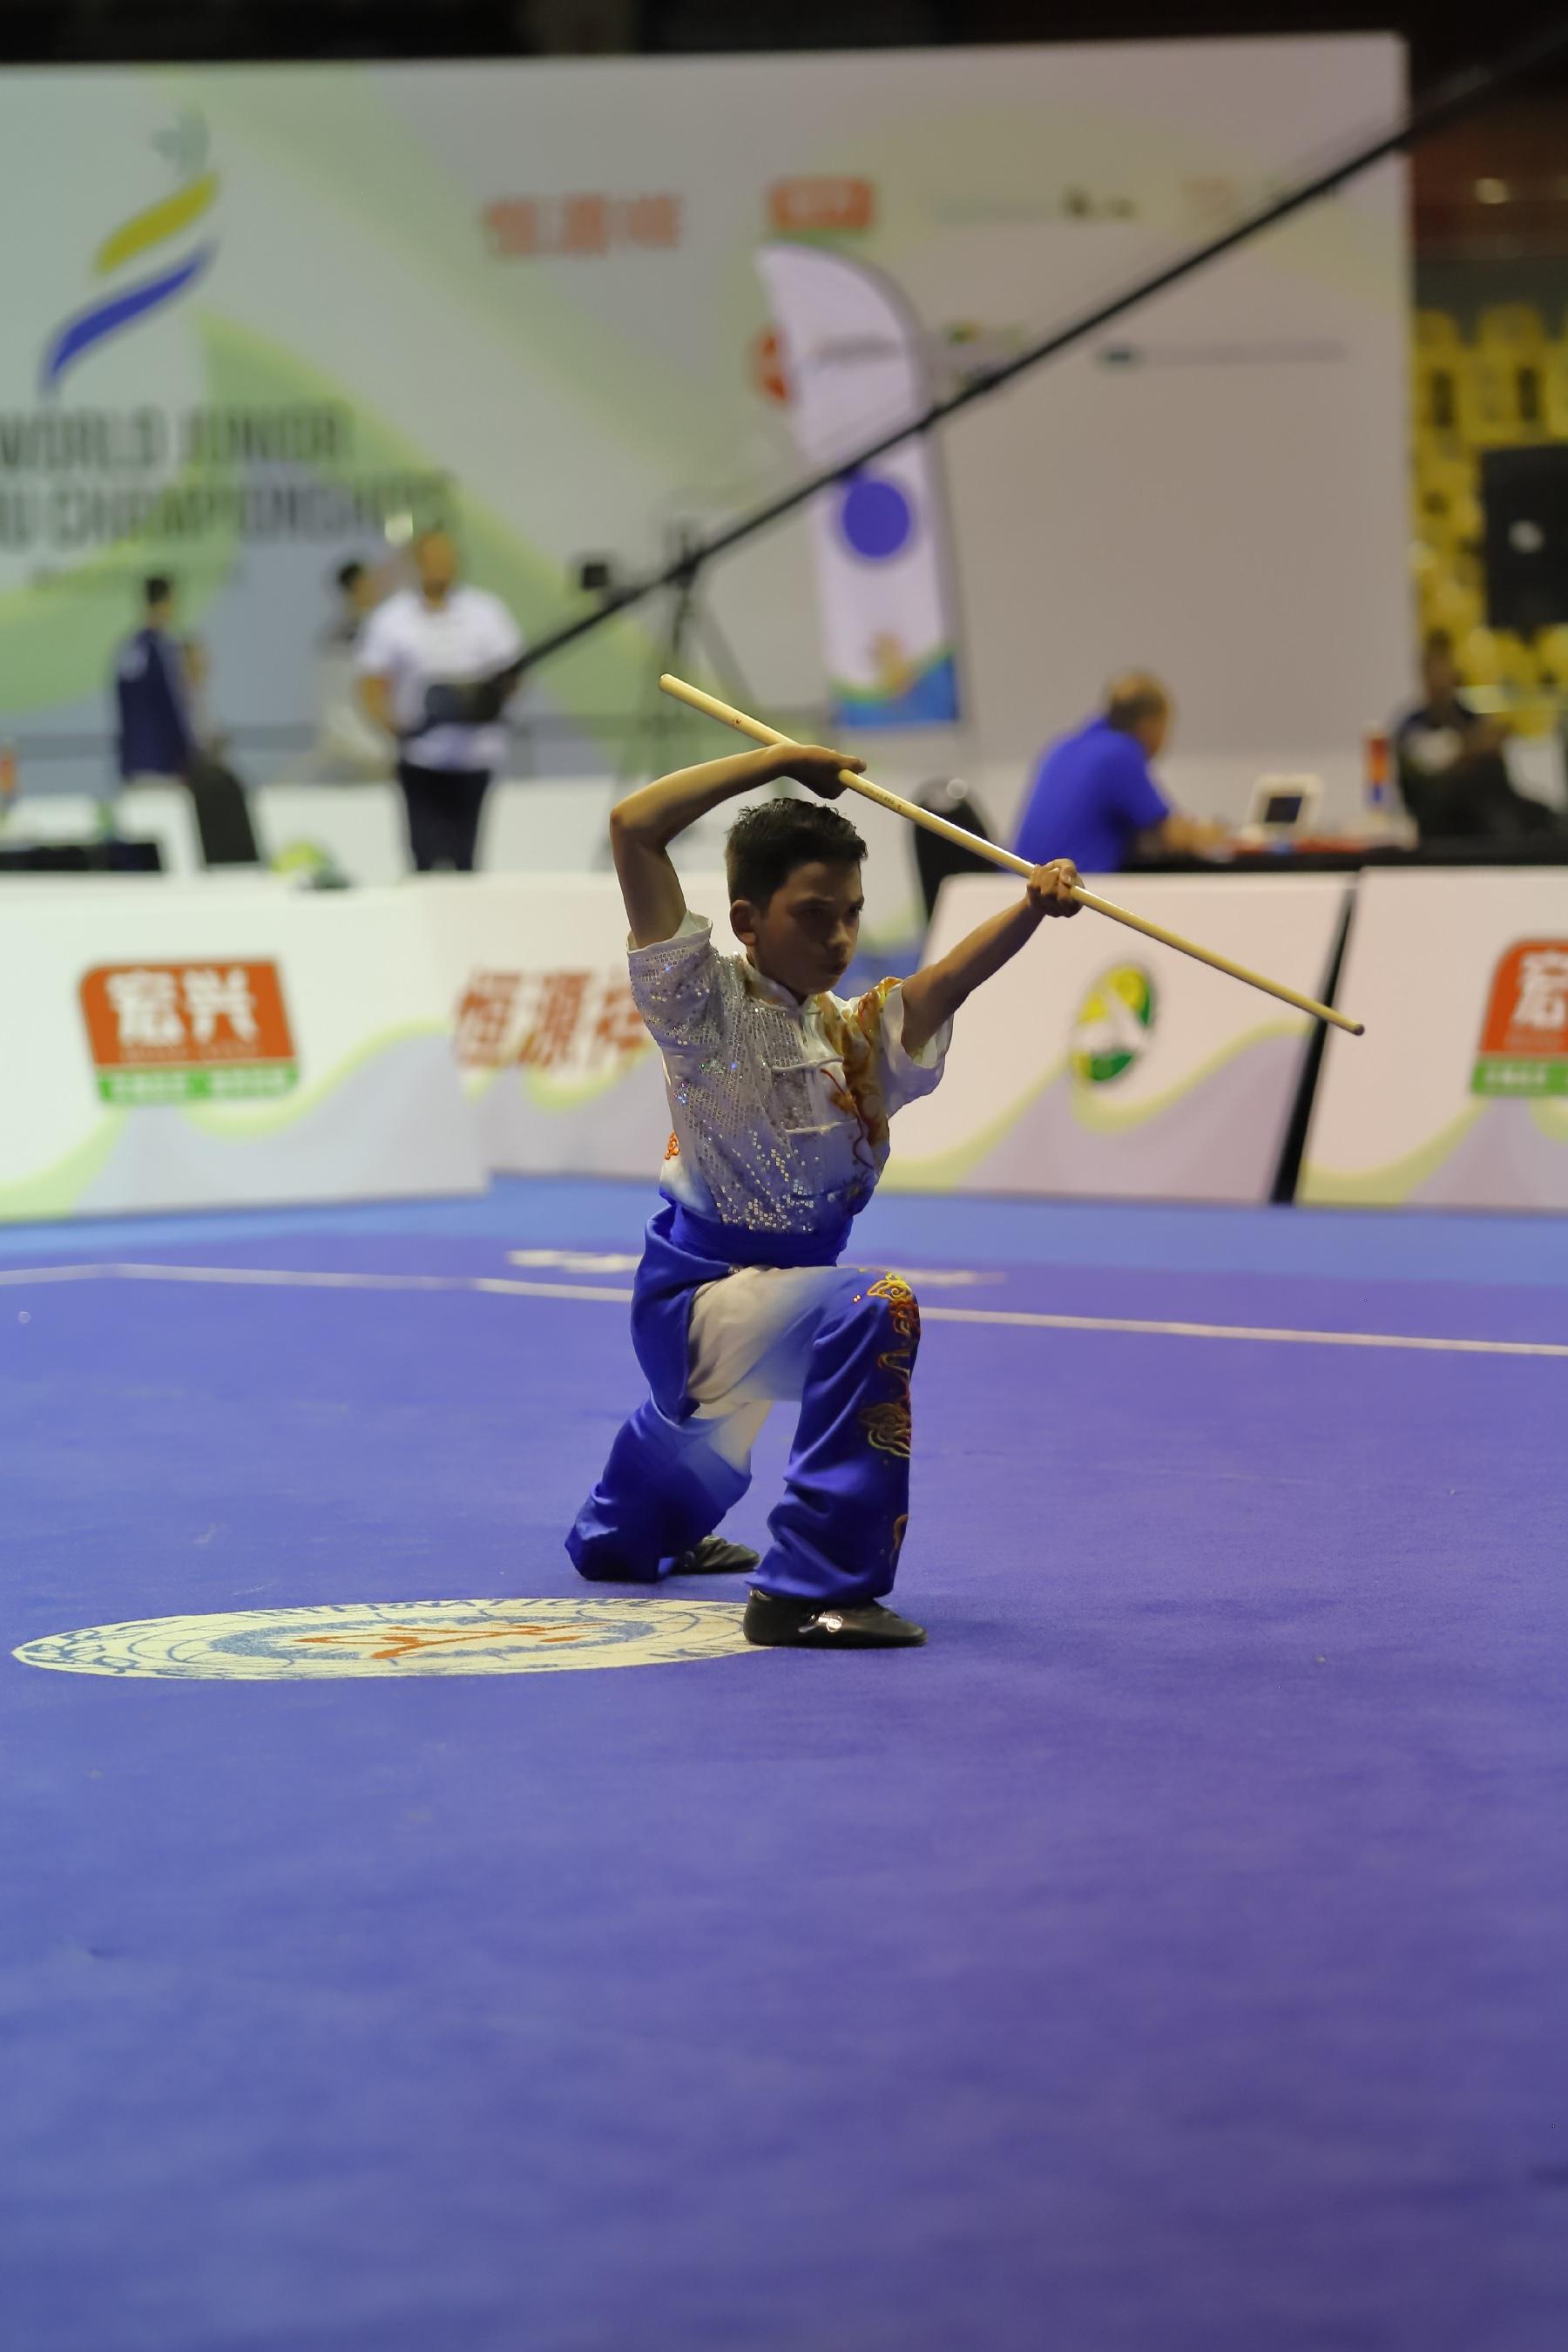 wayland-li-wushu-brazil-world-junior-wushu-championships-2018-team-canada-07.jpg